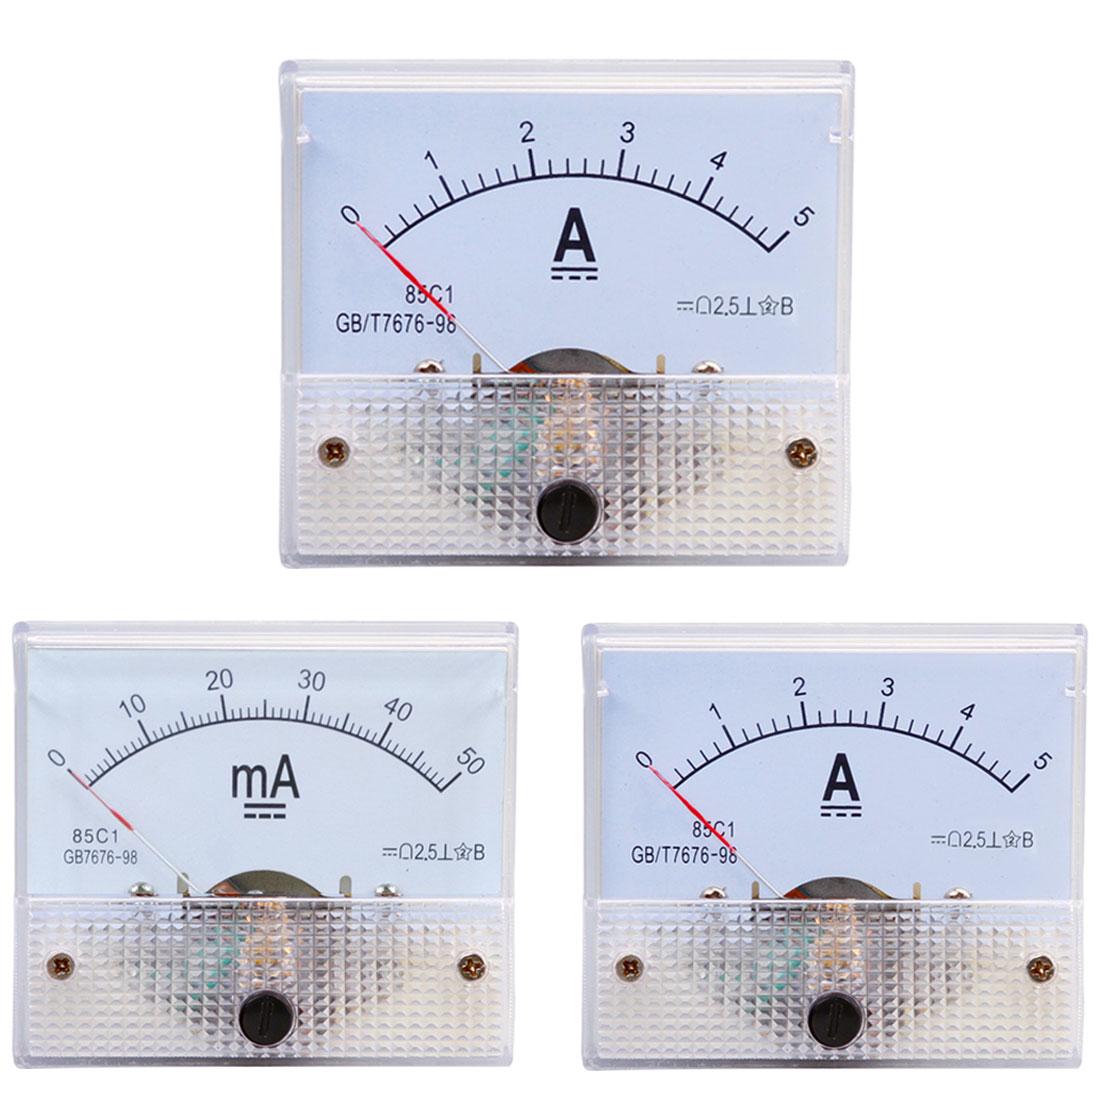 Mechanical Ammeter DC Analog Current Meter Panel Mechanical Pointer Type 5A/10A/15A/20A/30A/50A/100A